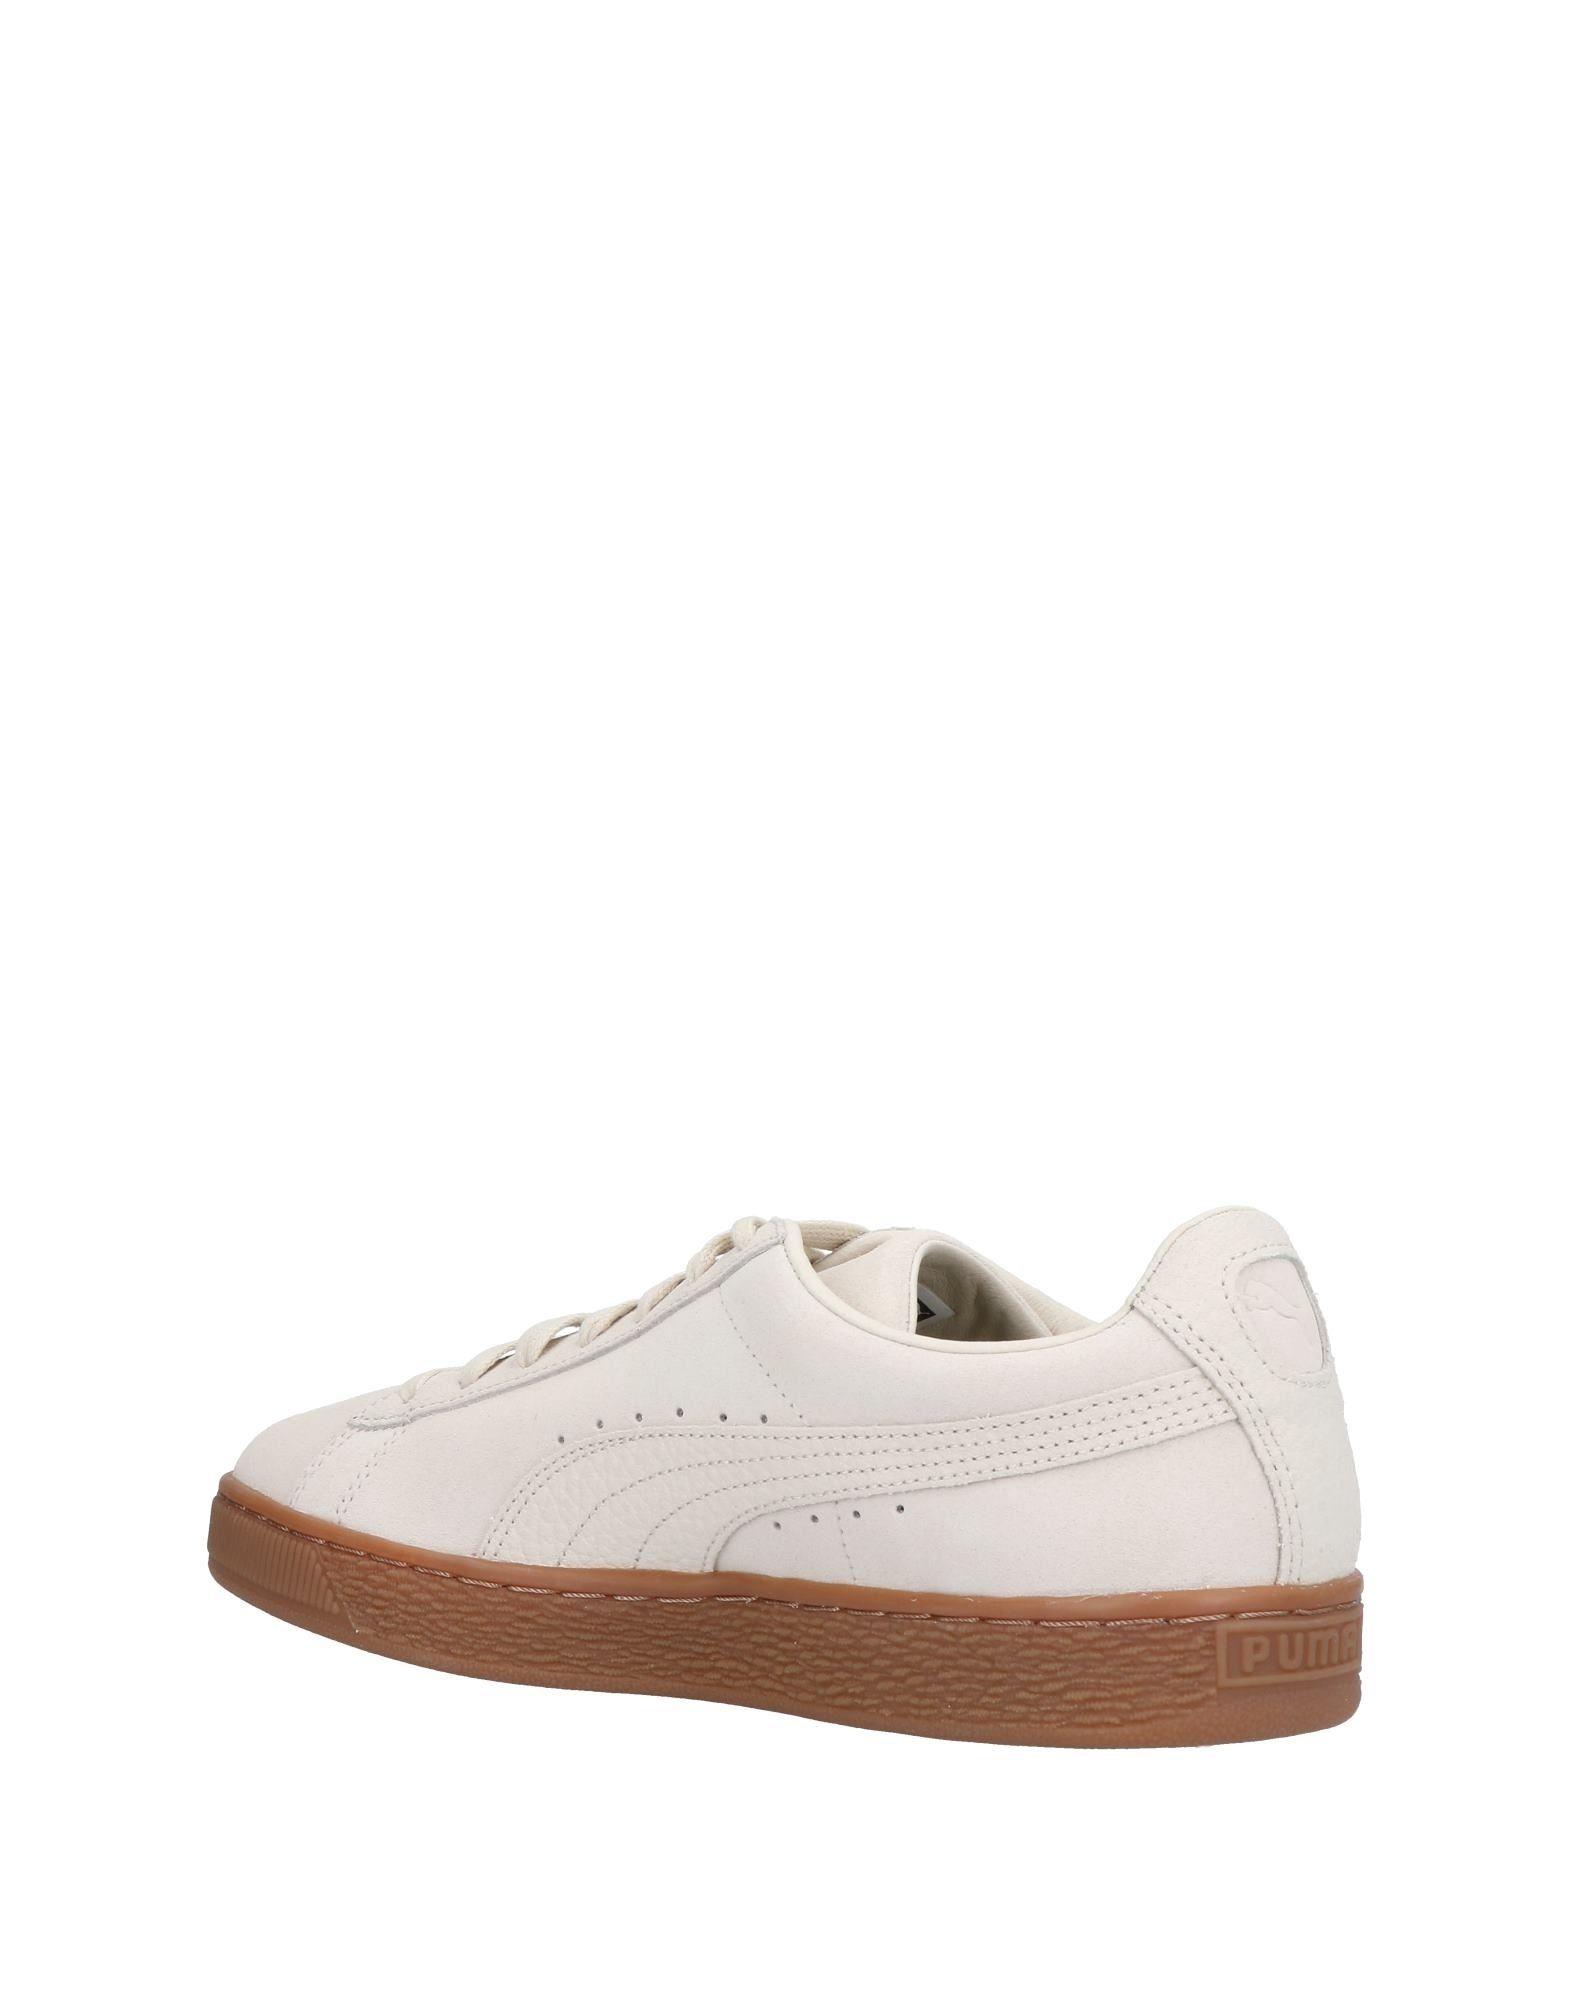 Puma Sneakers Herren  Heiße 11469618RO Heiße  Schuhe f23fc3